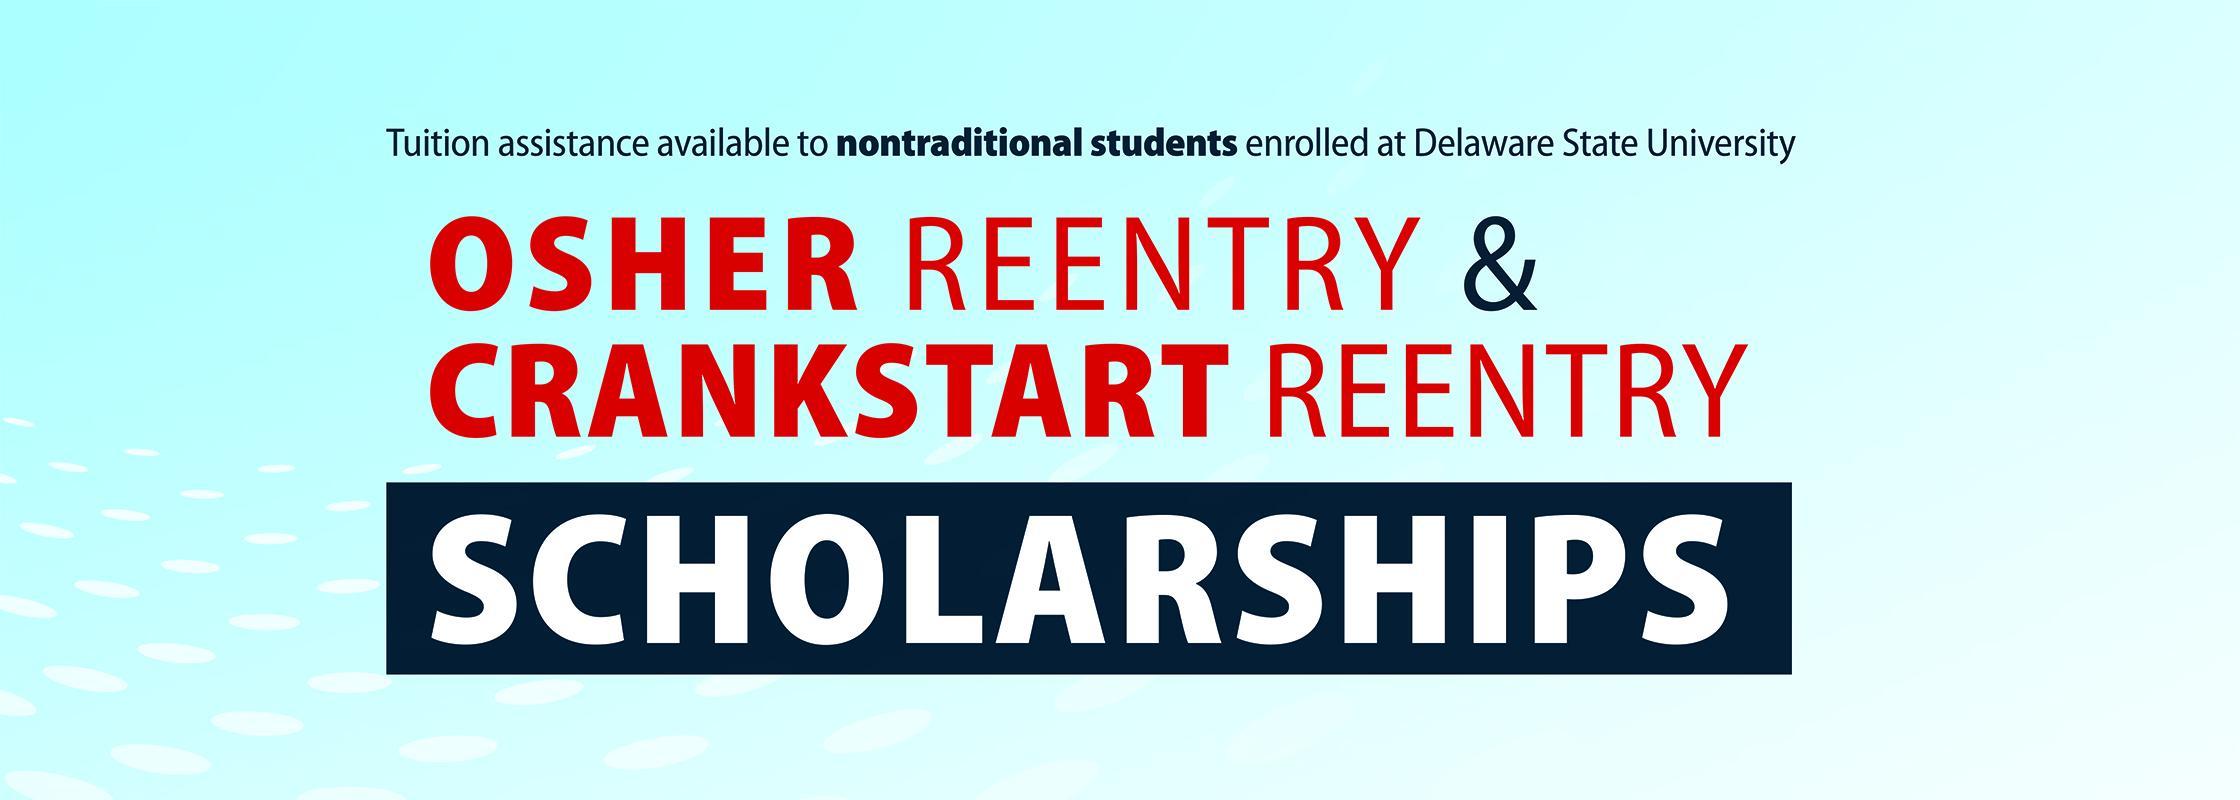 Osher Reentry Crankstart Reentry Scholarships